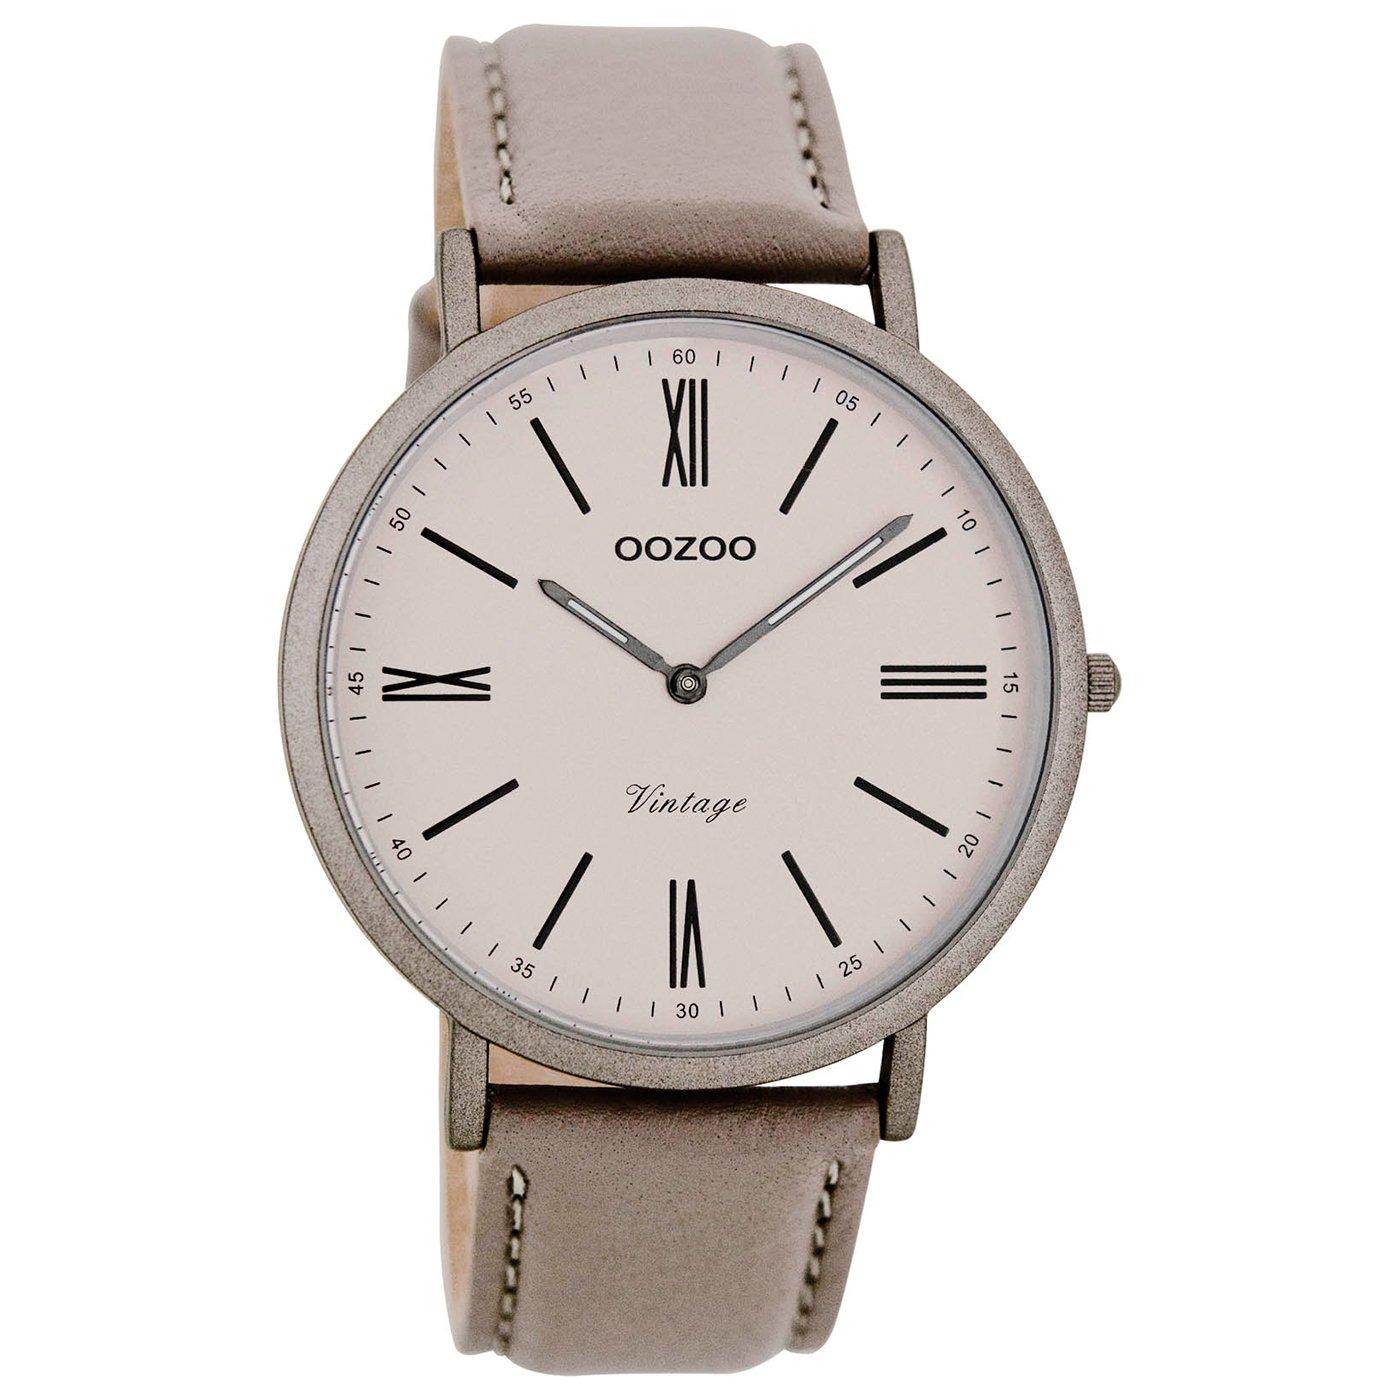 Quarz Digital Herren Uhr Armband Leder Mit C7711Uhren Oozoo iuPZkX